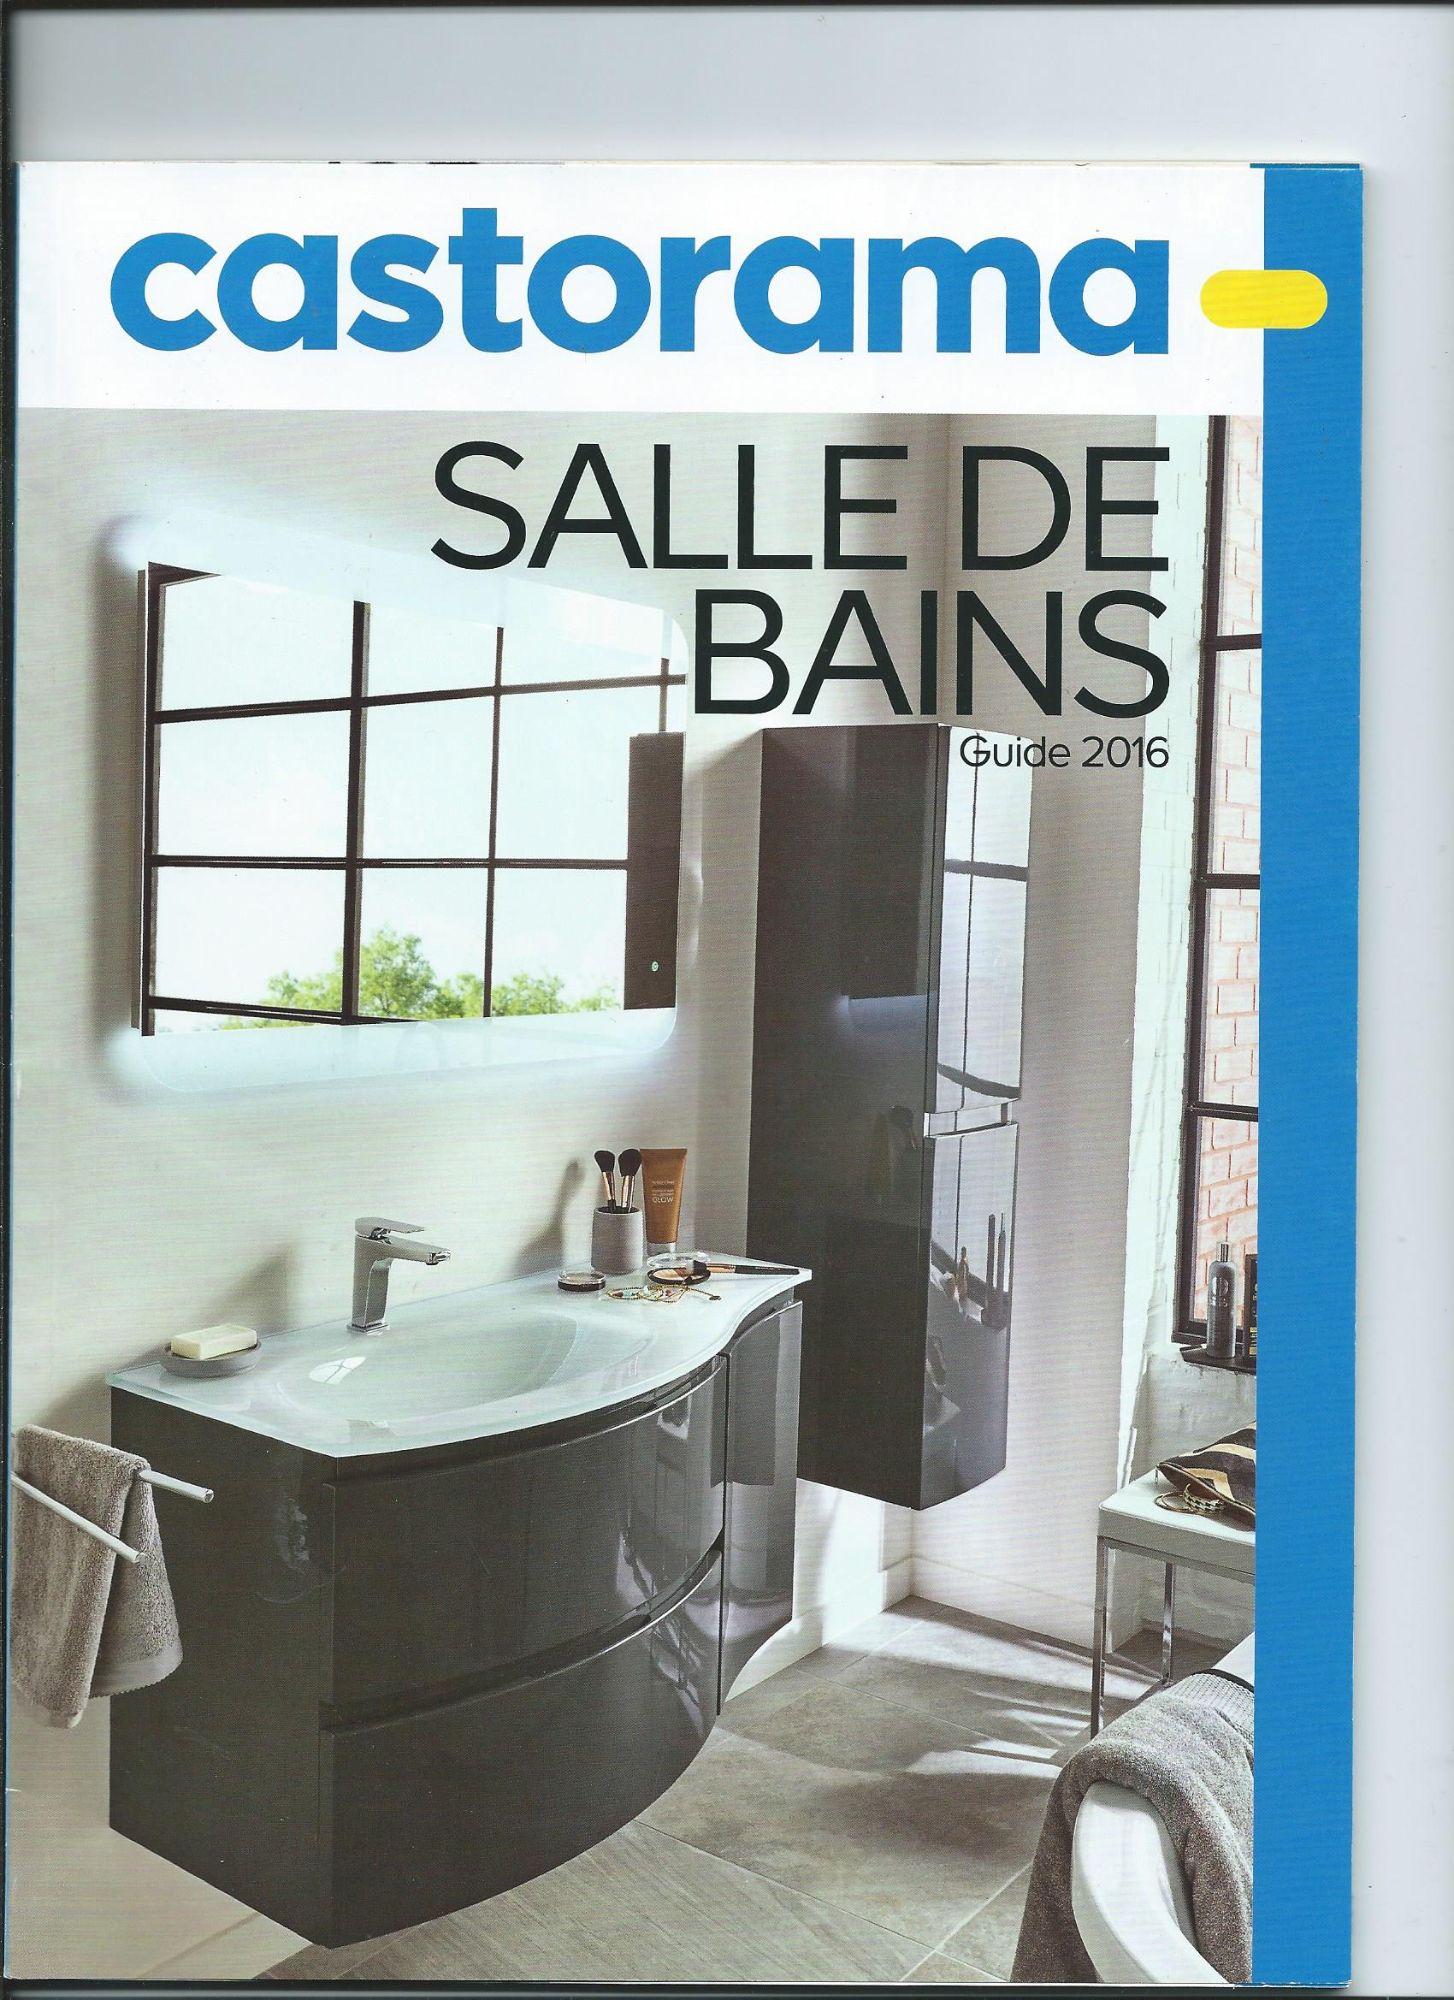 Catalogue Castorama Salle De Bains Guide 2016 Rakuten